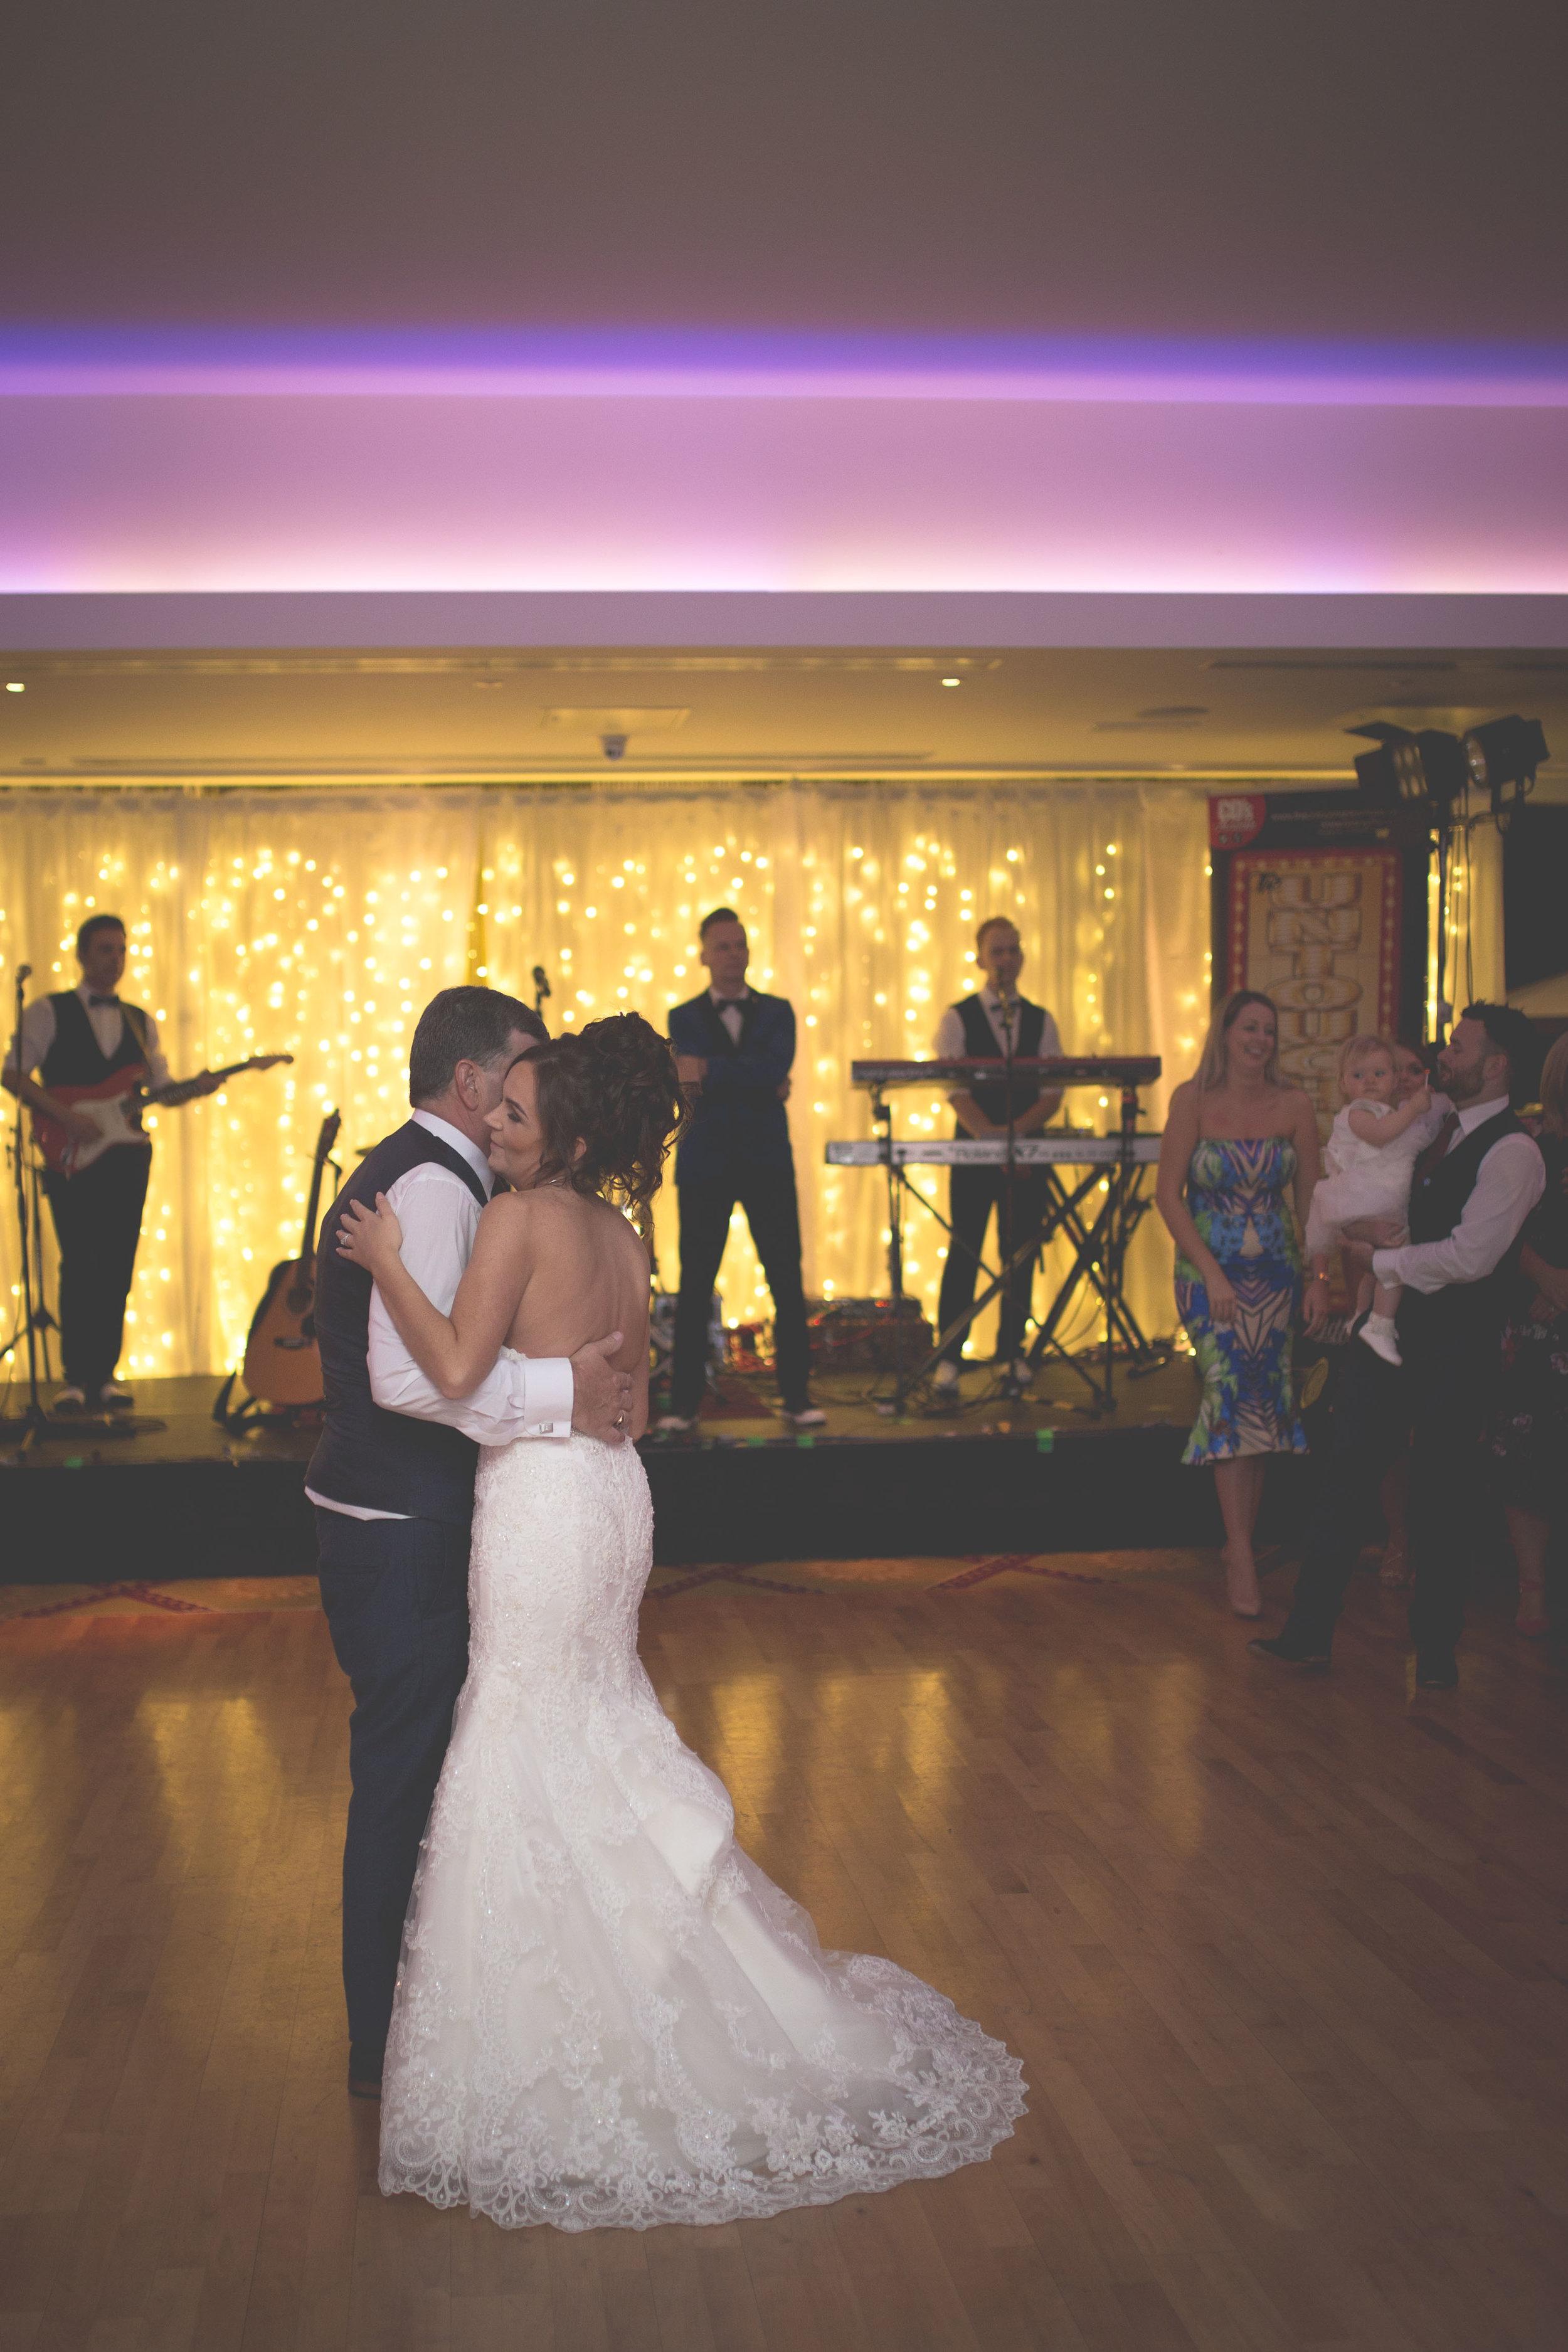 Aisling & Andy - First Dance-37.jpg